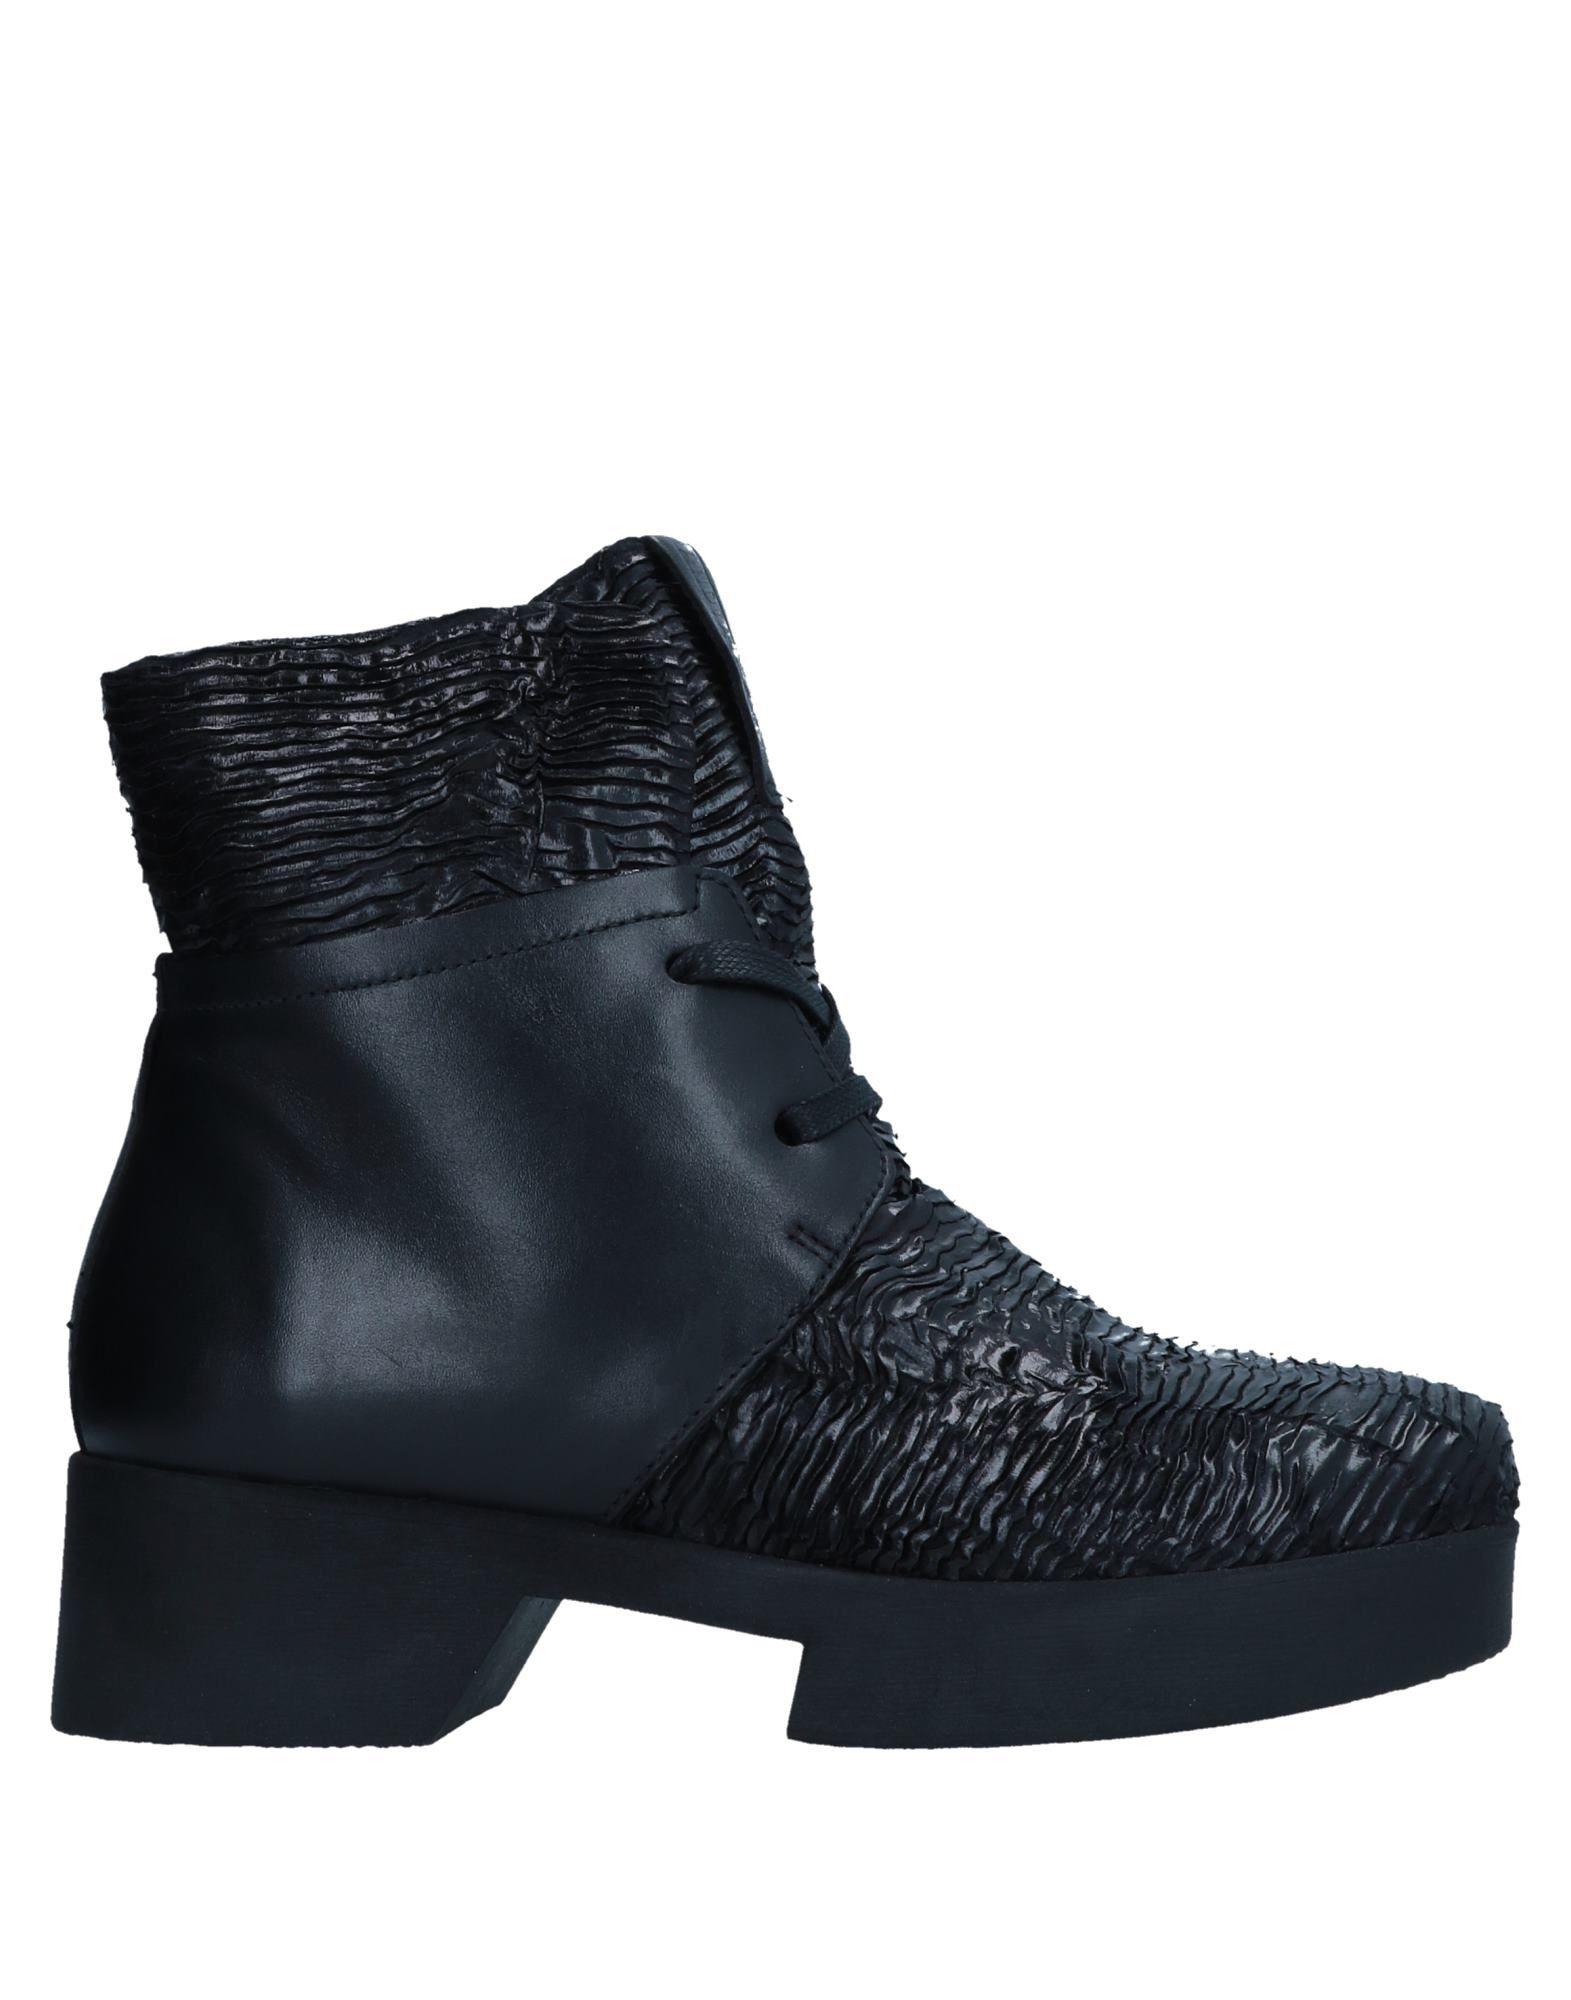 Gut tragenAndìa um billige Schuhe zu tragenAndìa Gut Fora Stiefelette Damen  11531546QQ cd1a47